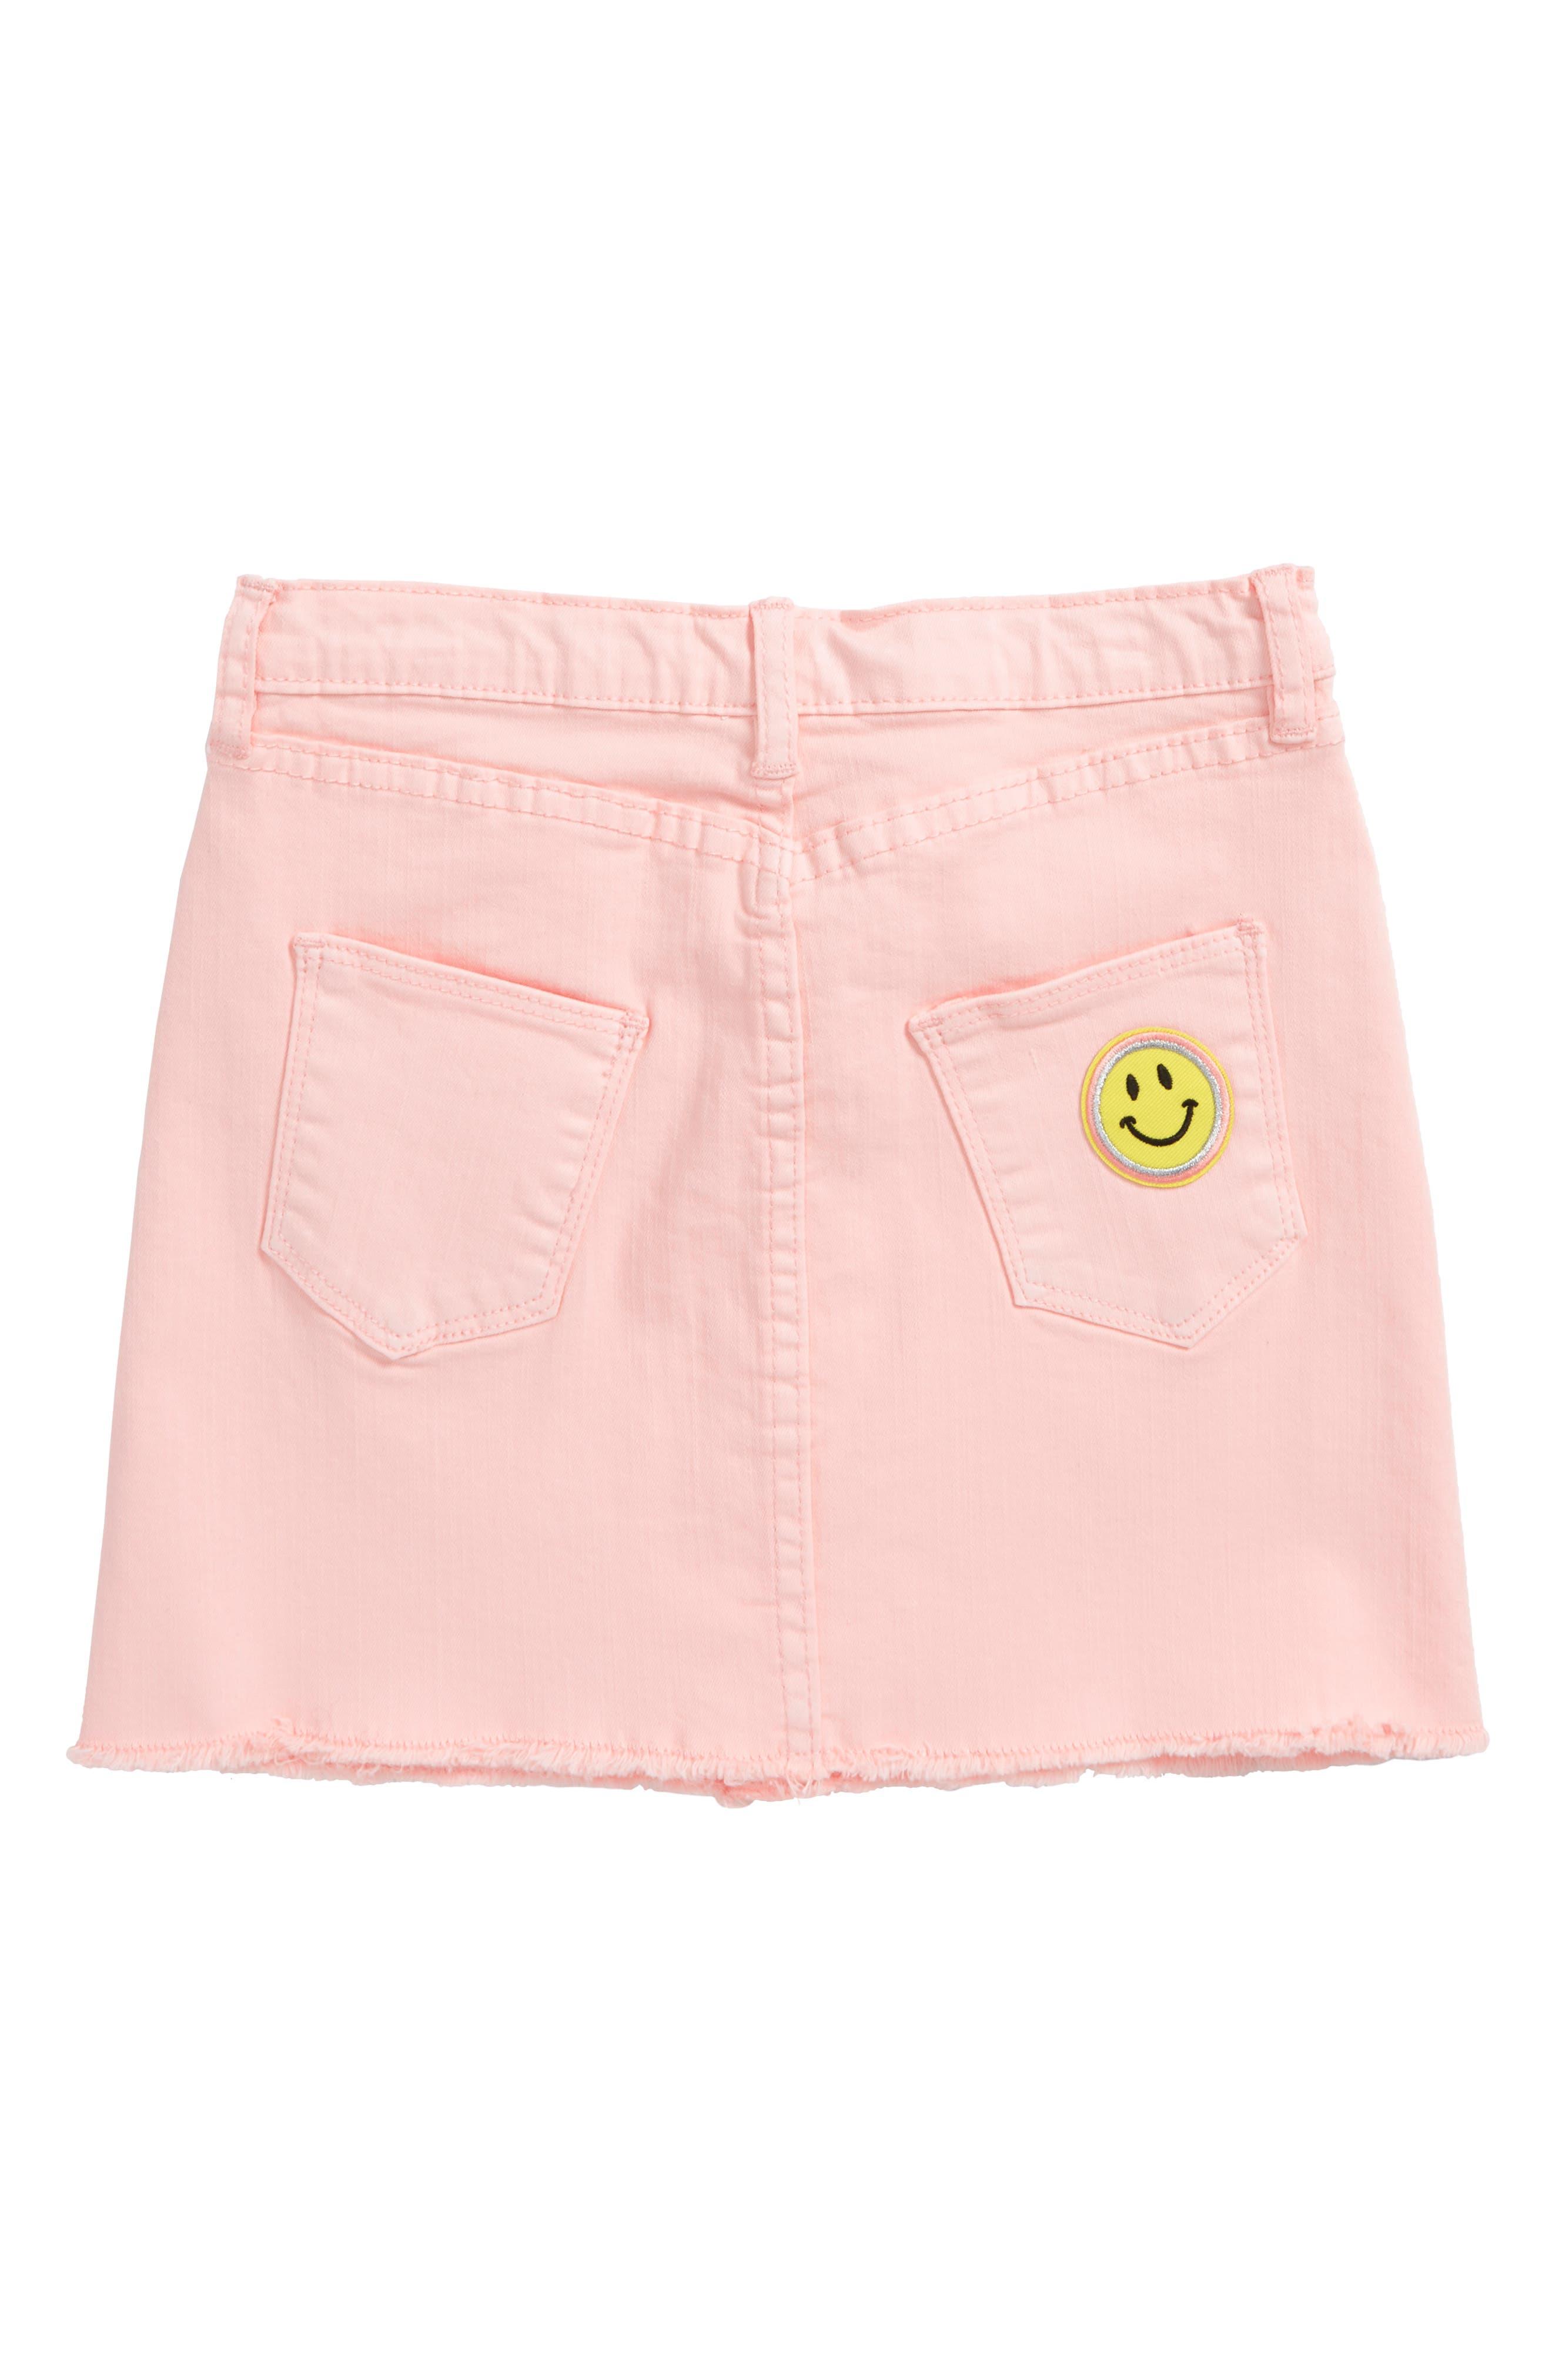 Flamingo Denim Skirt,                             Alternate thumbnail 2, color,                             Pink